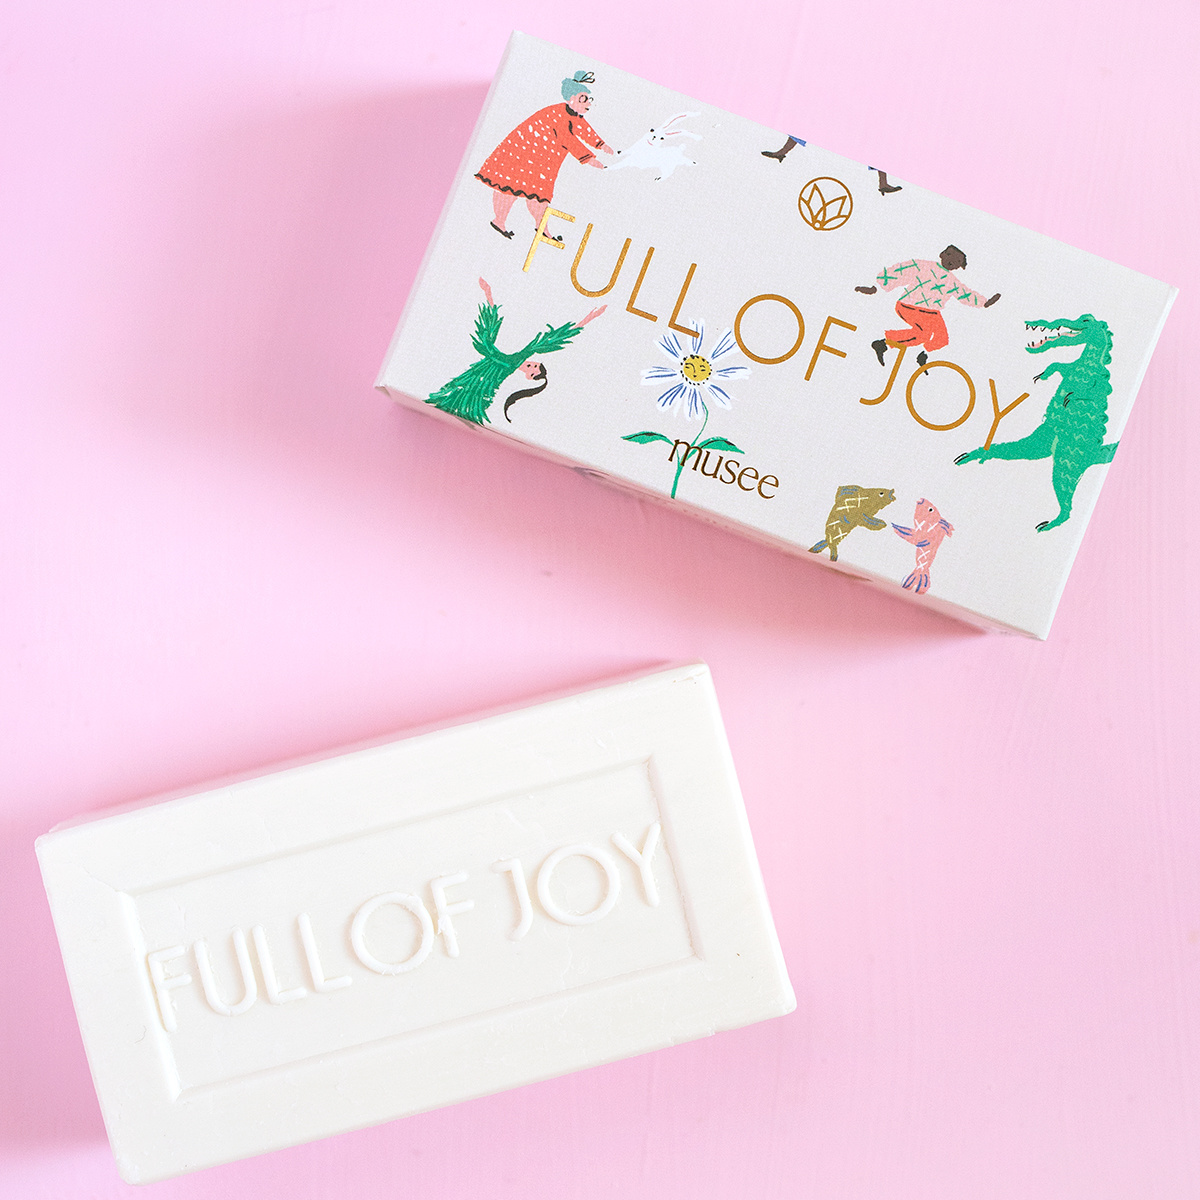 Musee - MUS Full of Joy - Bar Soap